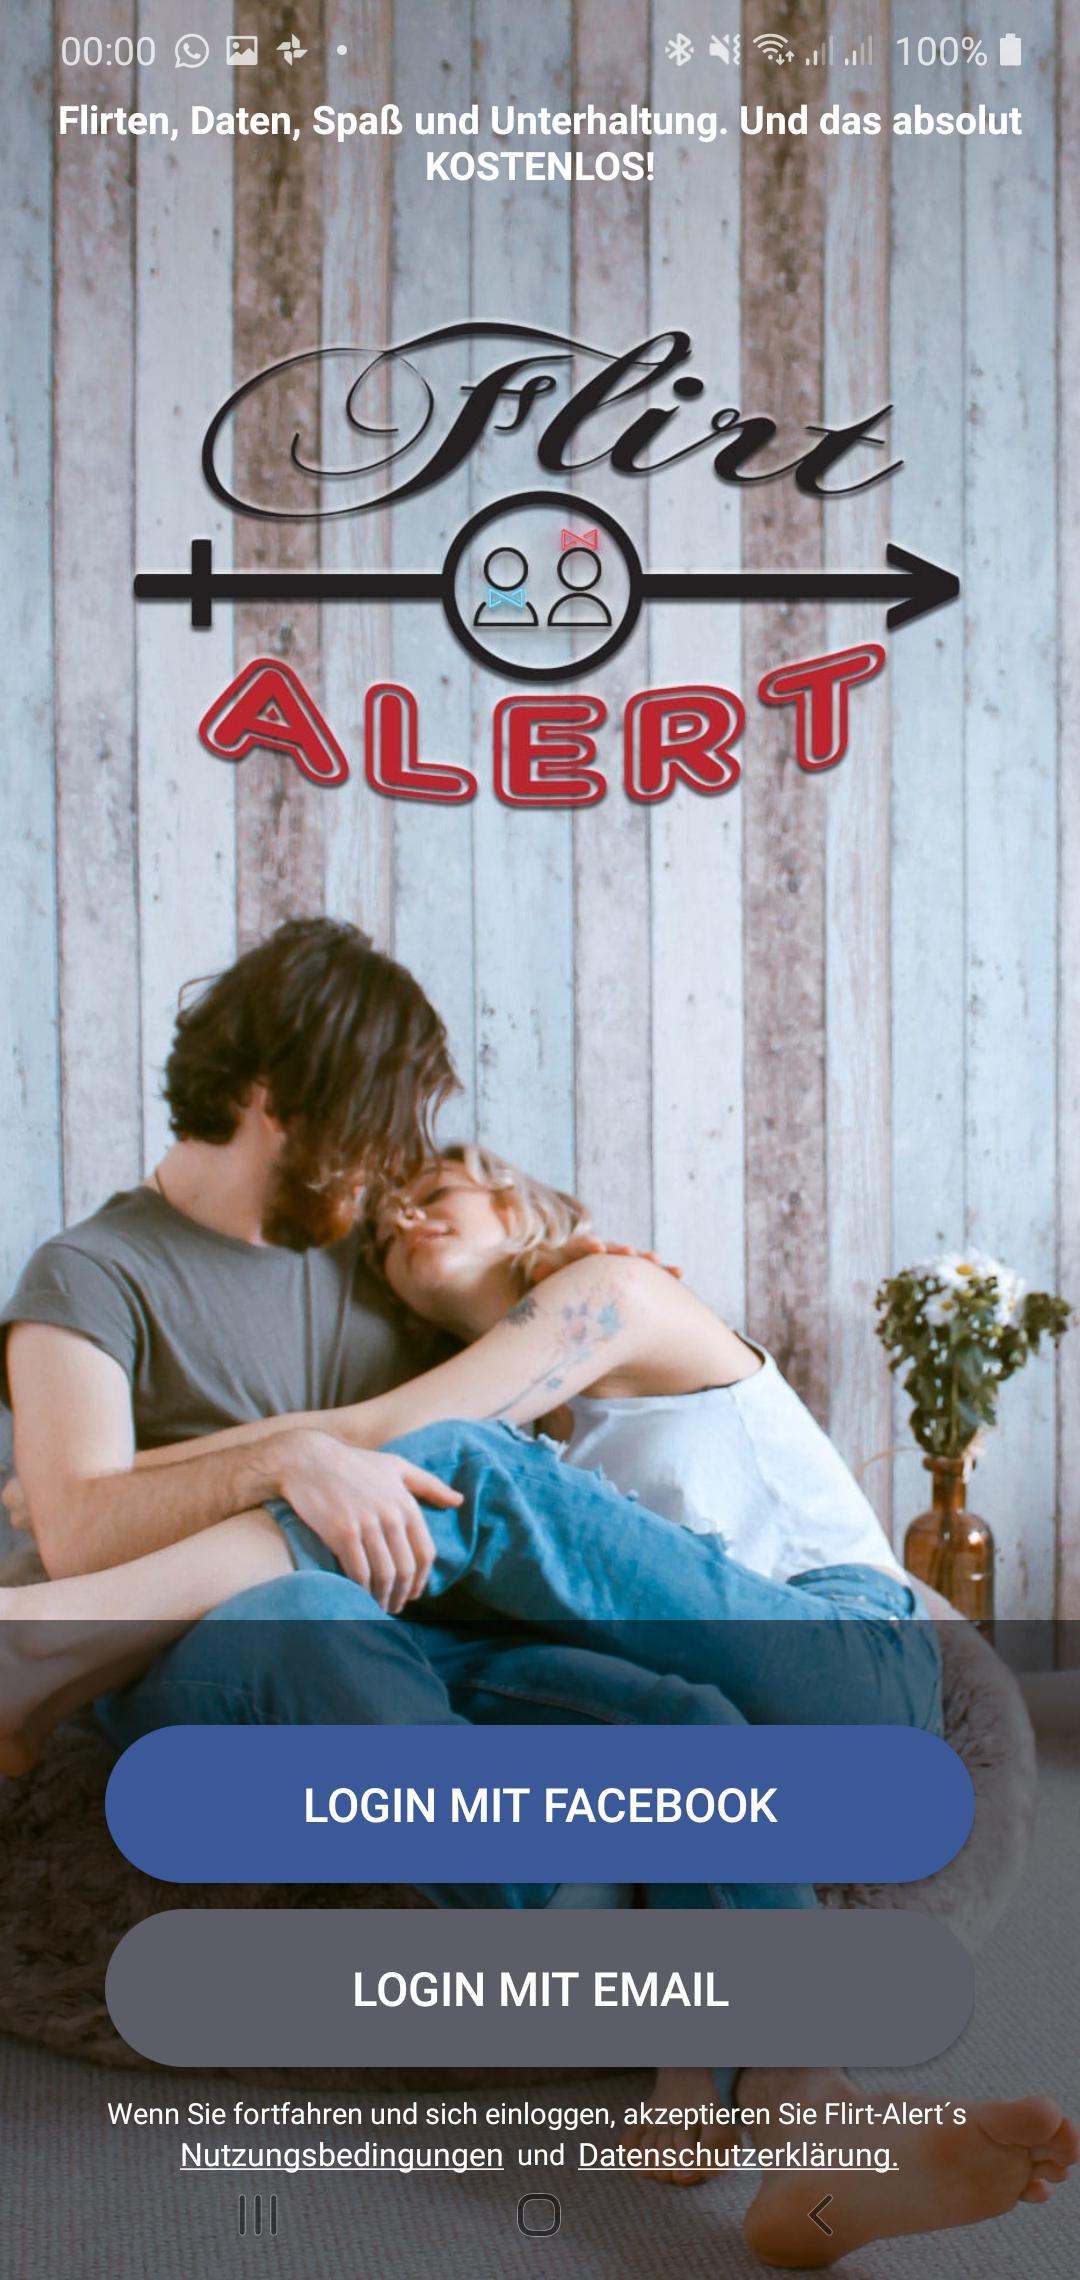 Super-dating-punkt uns chat